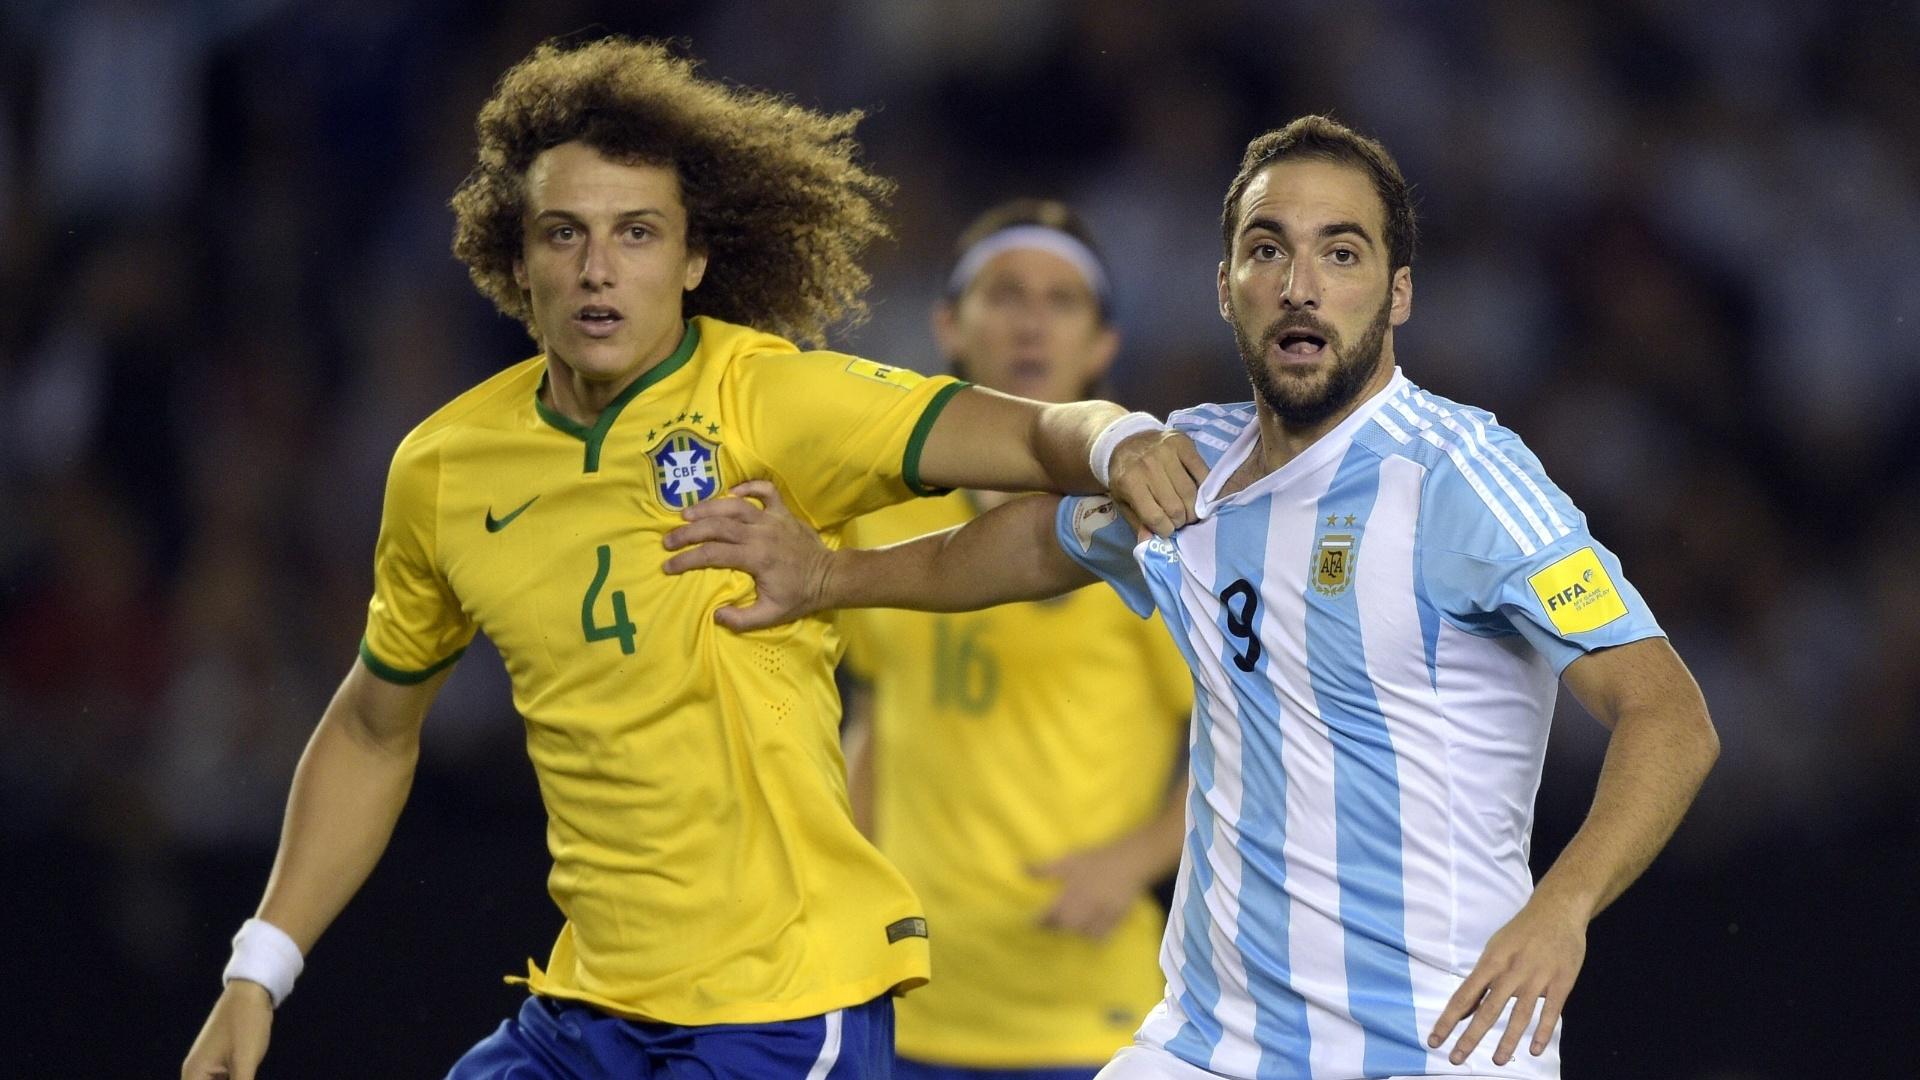 David Luiz e Higuain disputam lance durante o clássico entre Brasil e Argentina